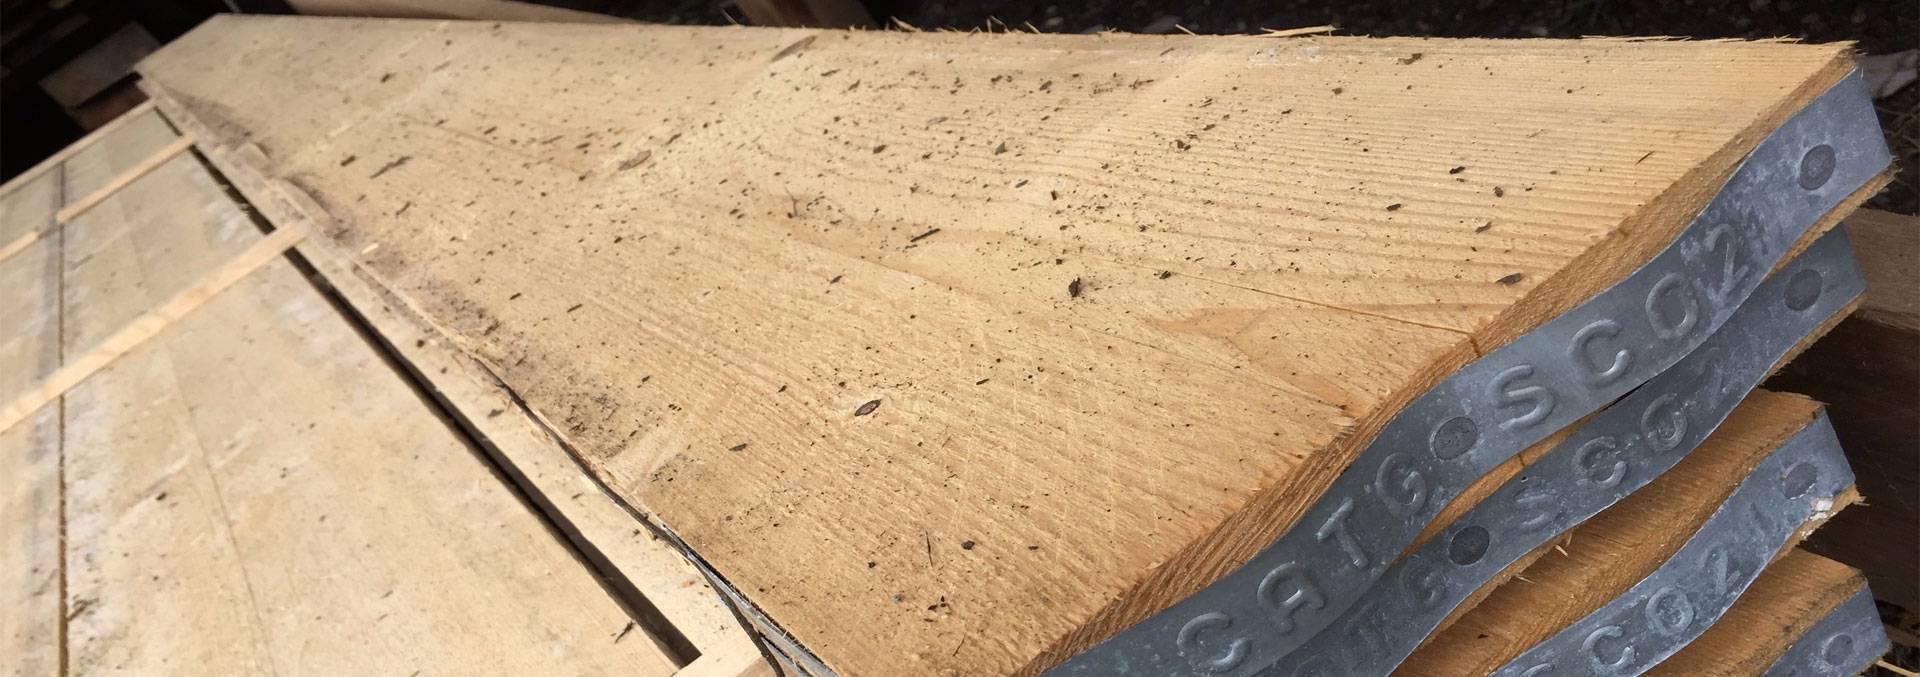 Scaffolding boards or planks